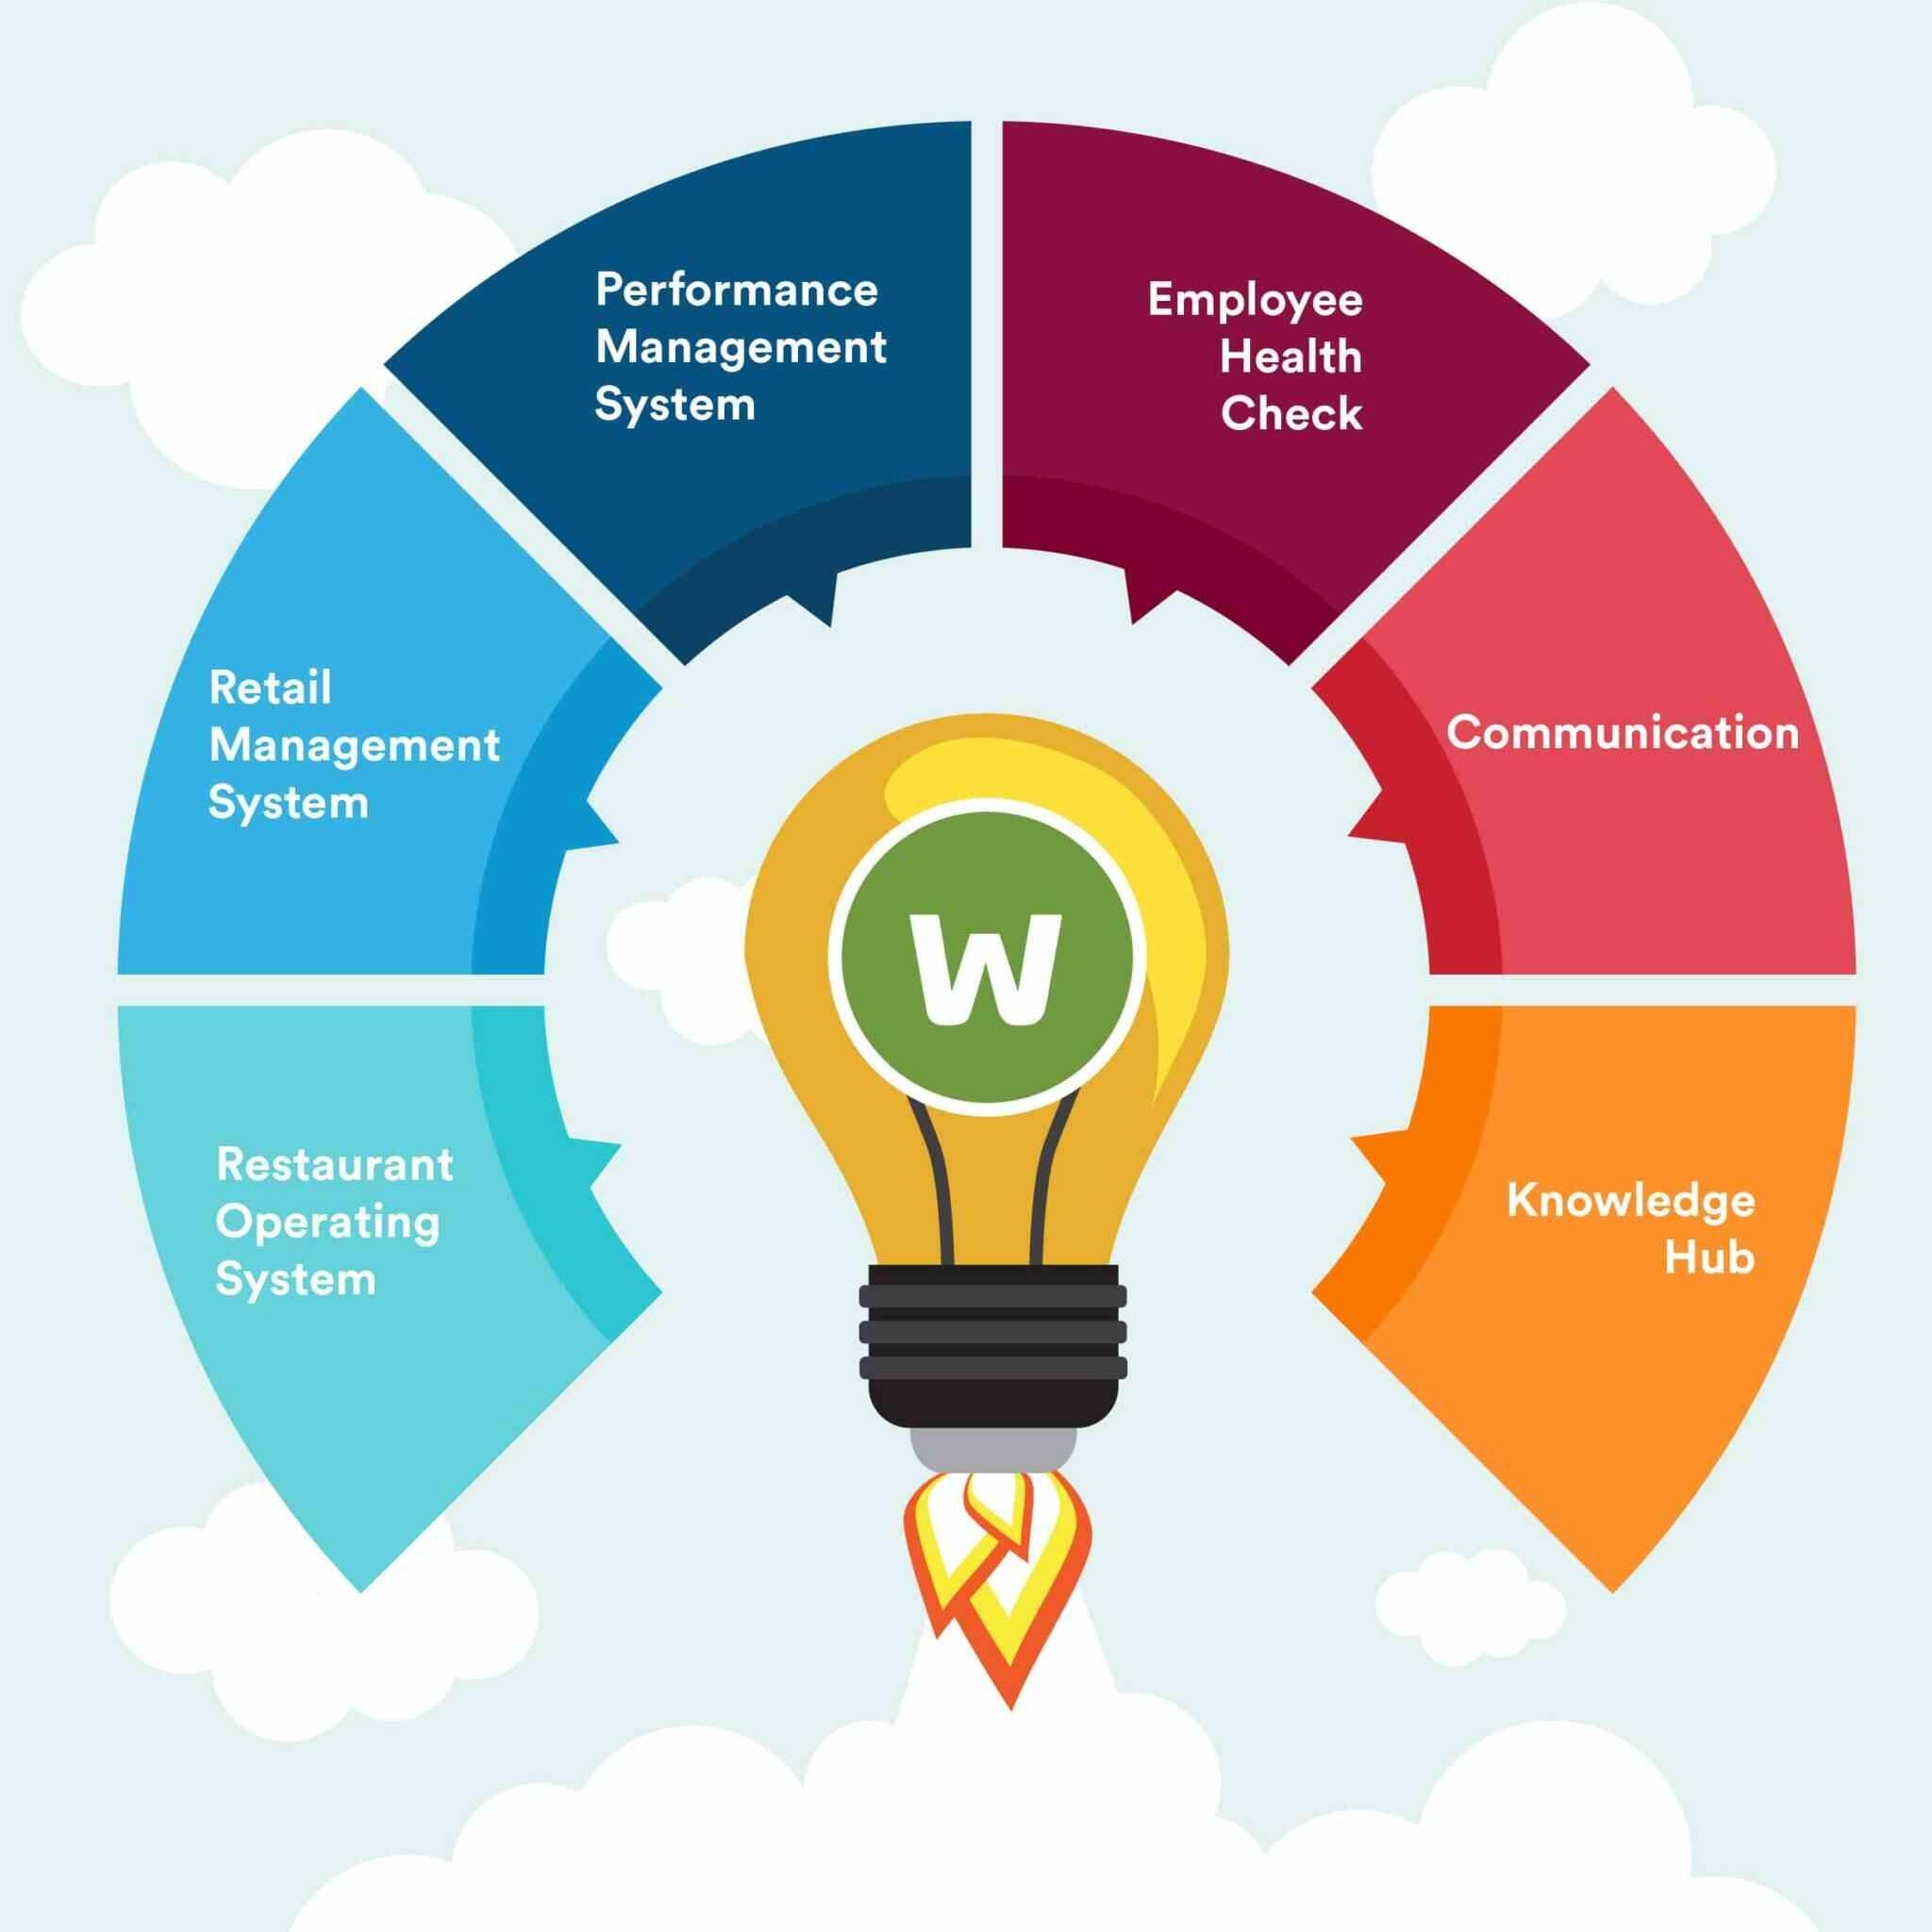 https://www.workpulse.com/wp-content/uploads/2021/07/Workpulse-Platform.jpg